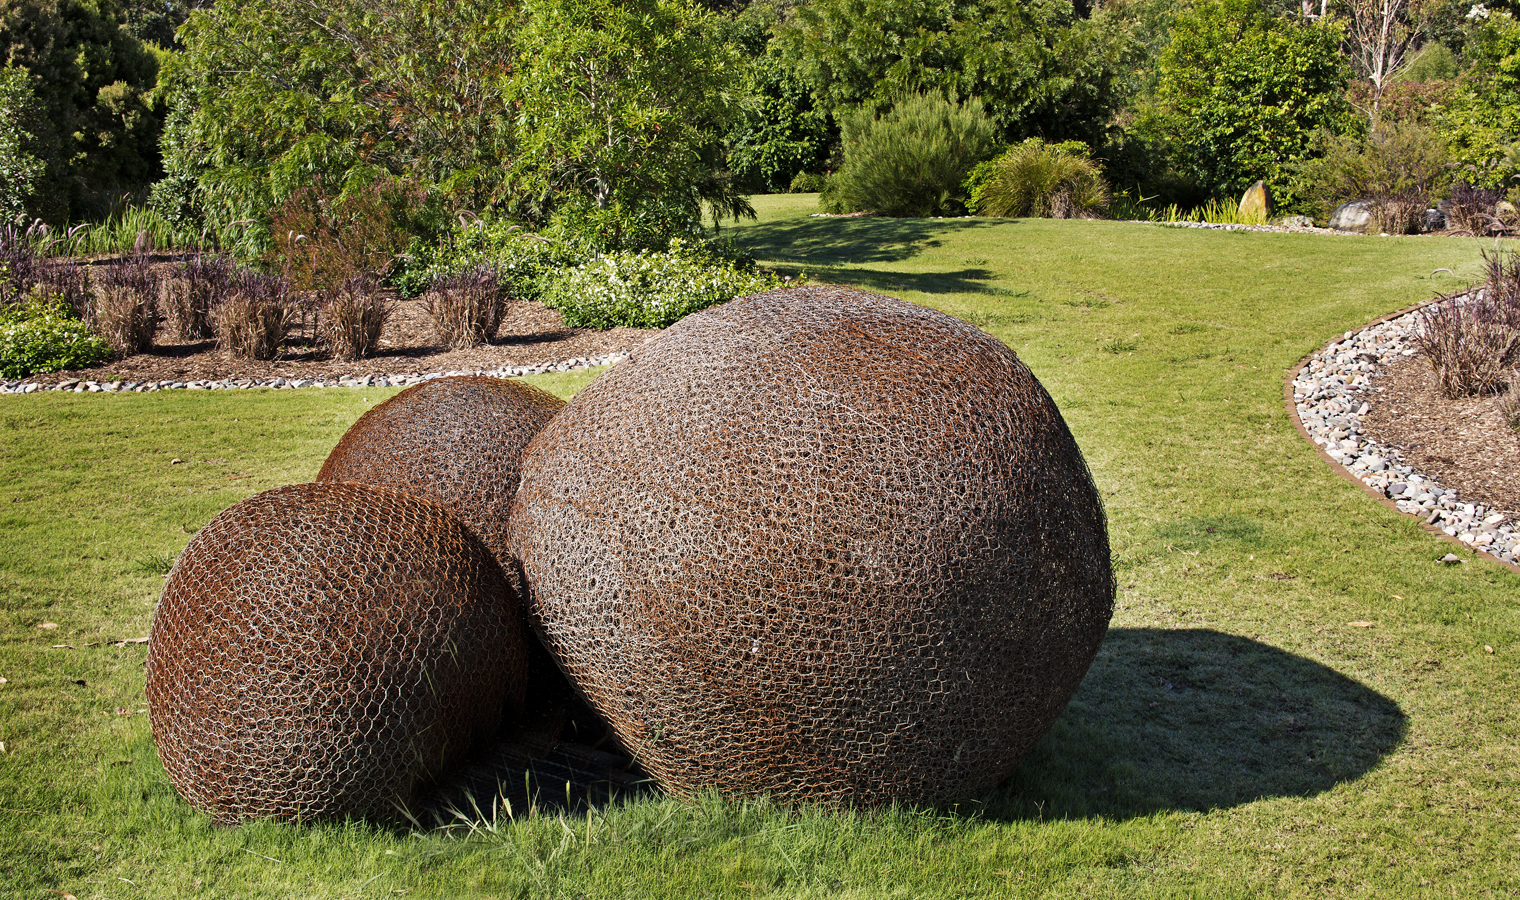 boulders-Sculpture-website-template-size-1520x900